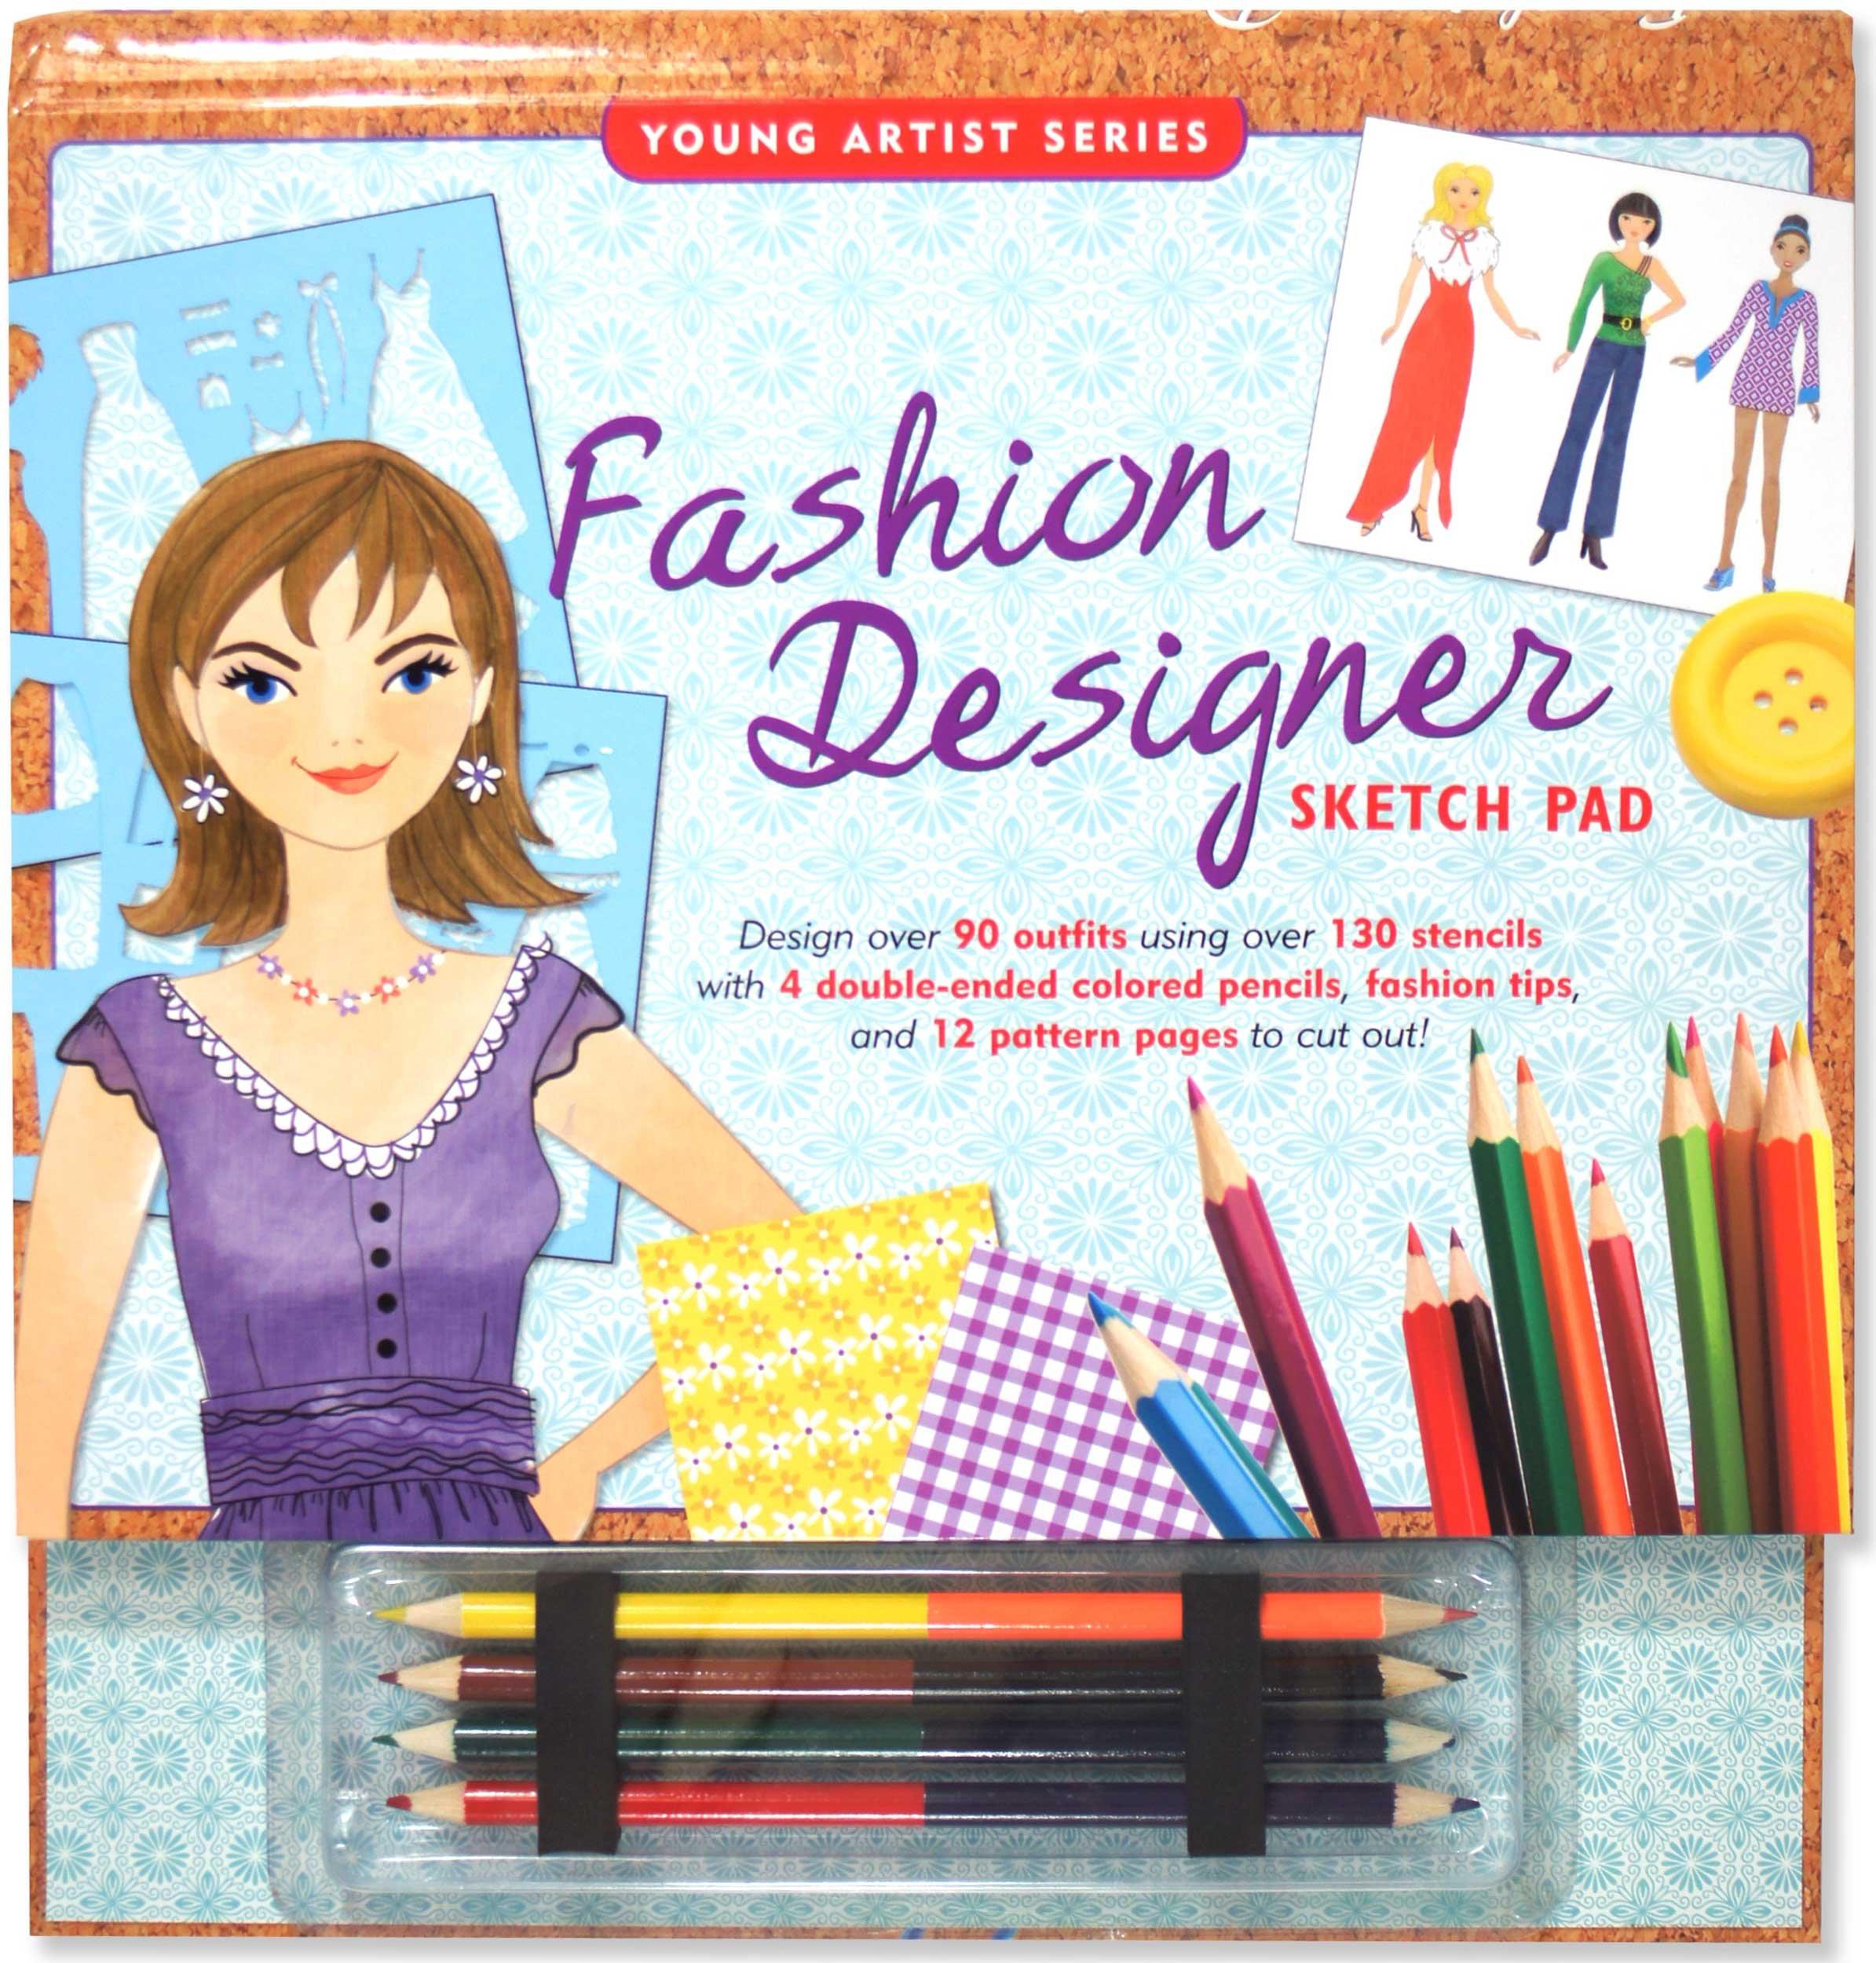 Fashion Designer Sketch Pad Fashion Sketch Kit Young Artist Peter Pauper Press Mara Conlon Amy Saidens 0706151300968 Amazon Com Books